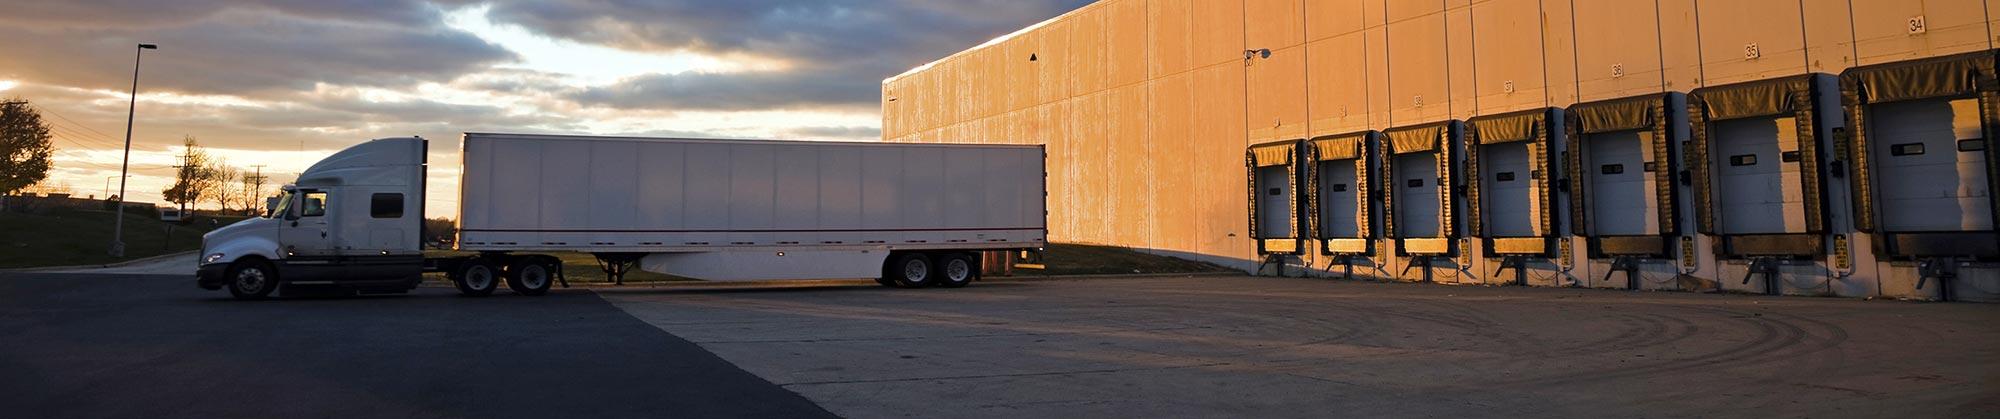 Partial Truckloads